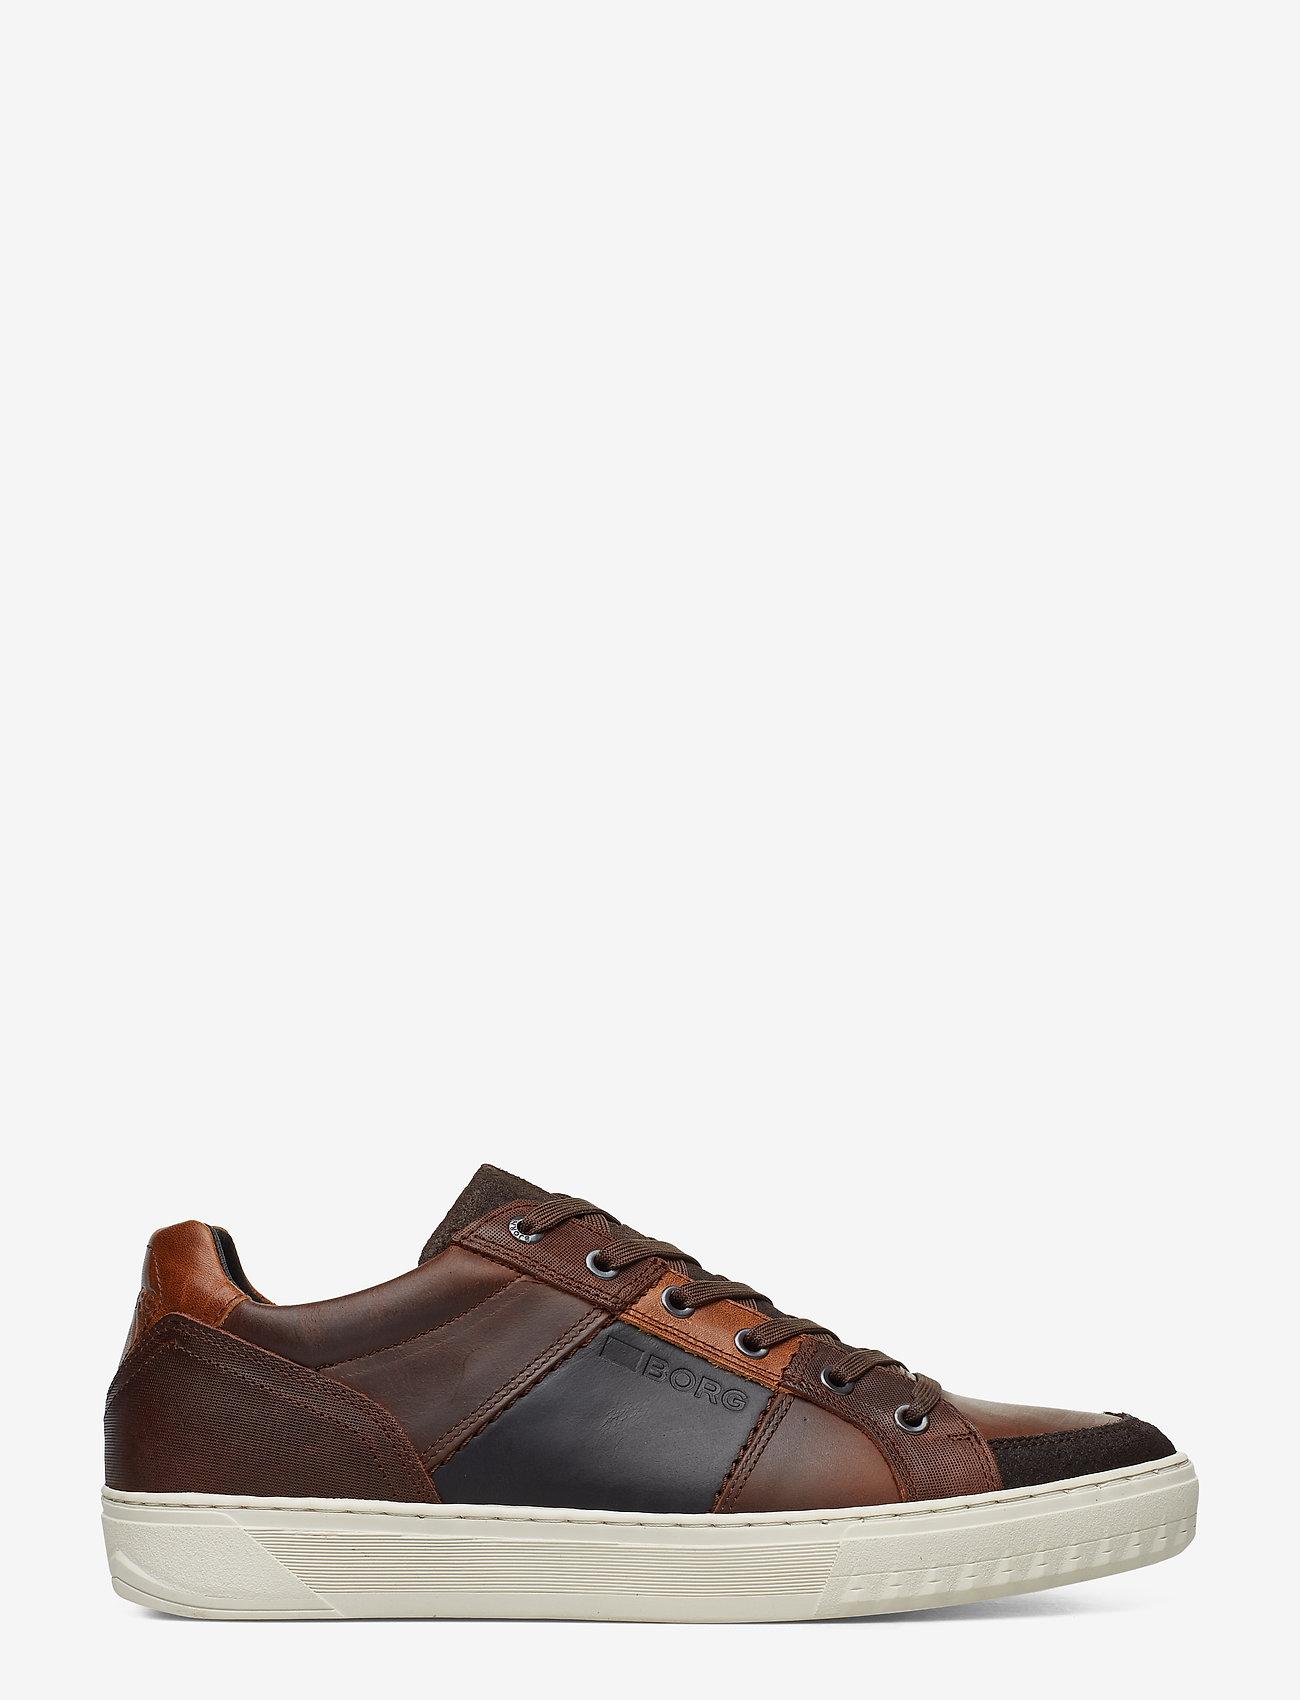 Björn Borg - COLLIN LOW DMT M - laag sneakers - dark brown - 1